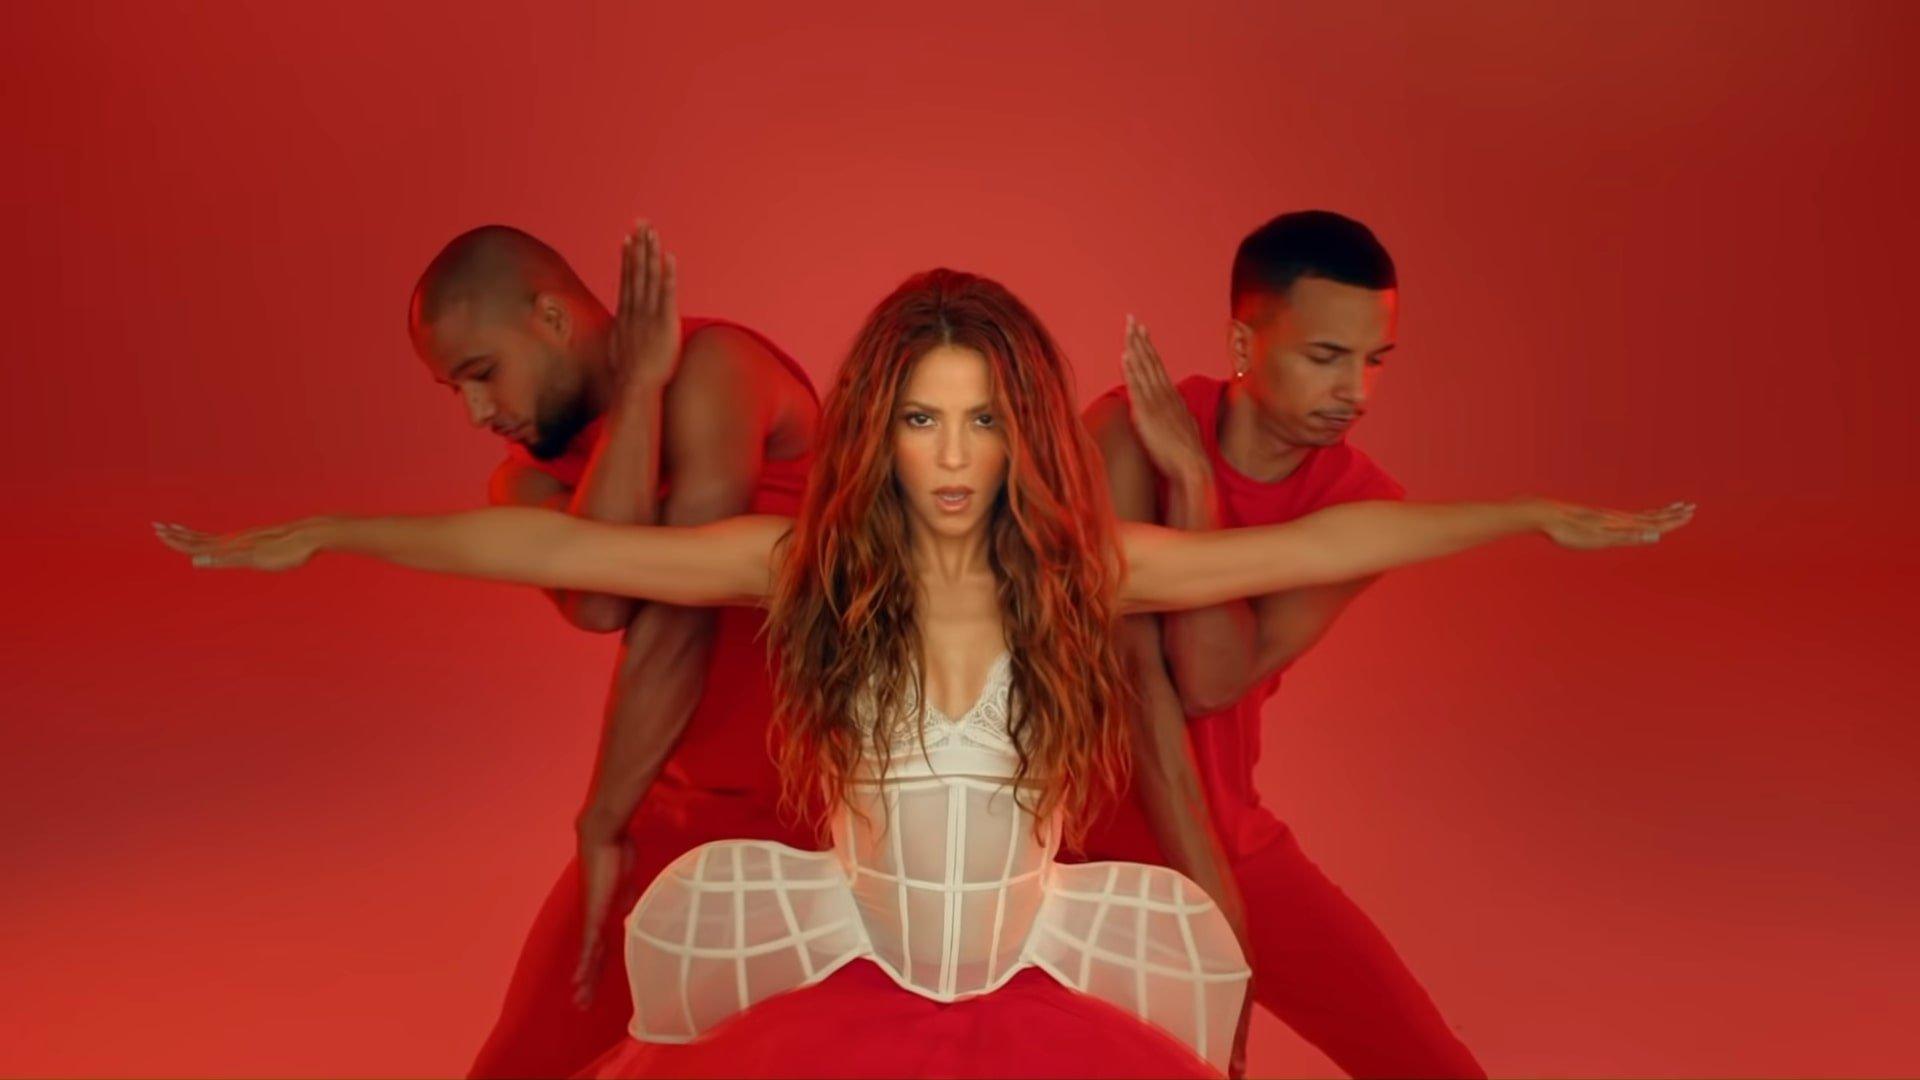 Black Eyed Peas, Shakira - GIRL LIKE ME (Official Music Video) 3-33 Screenshot